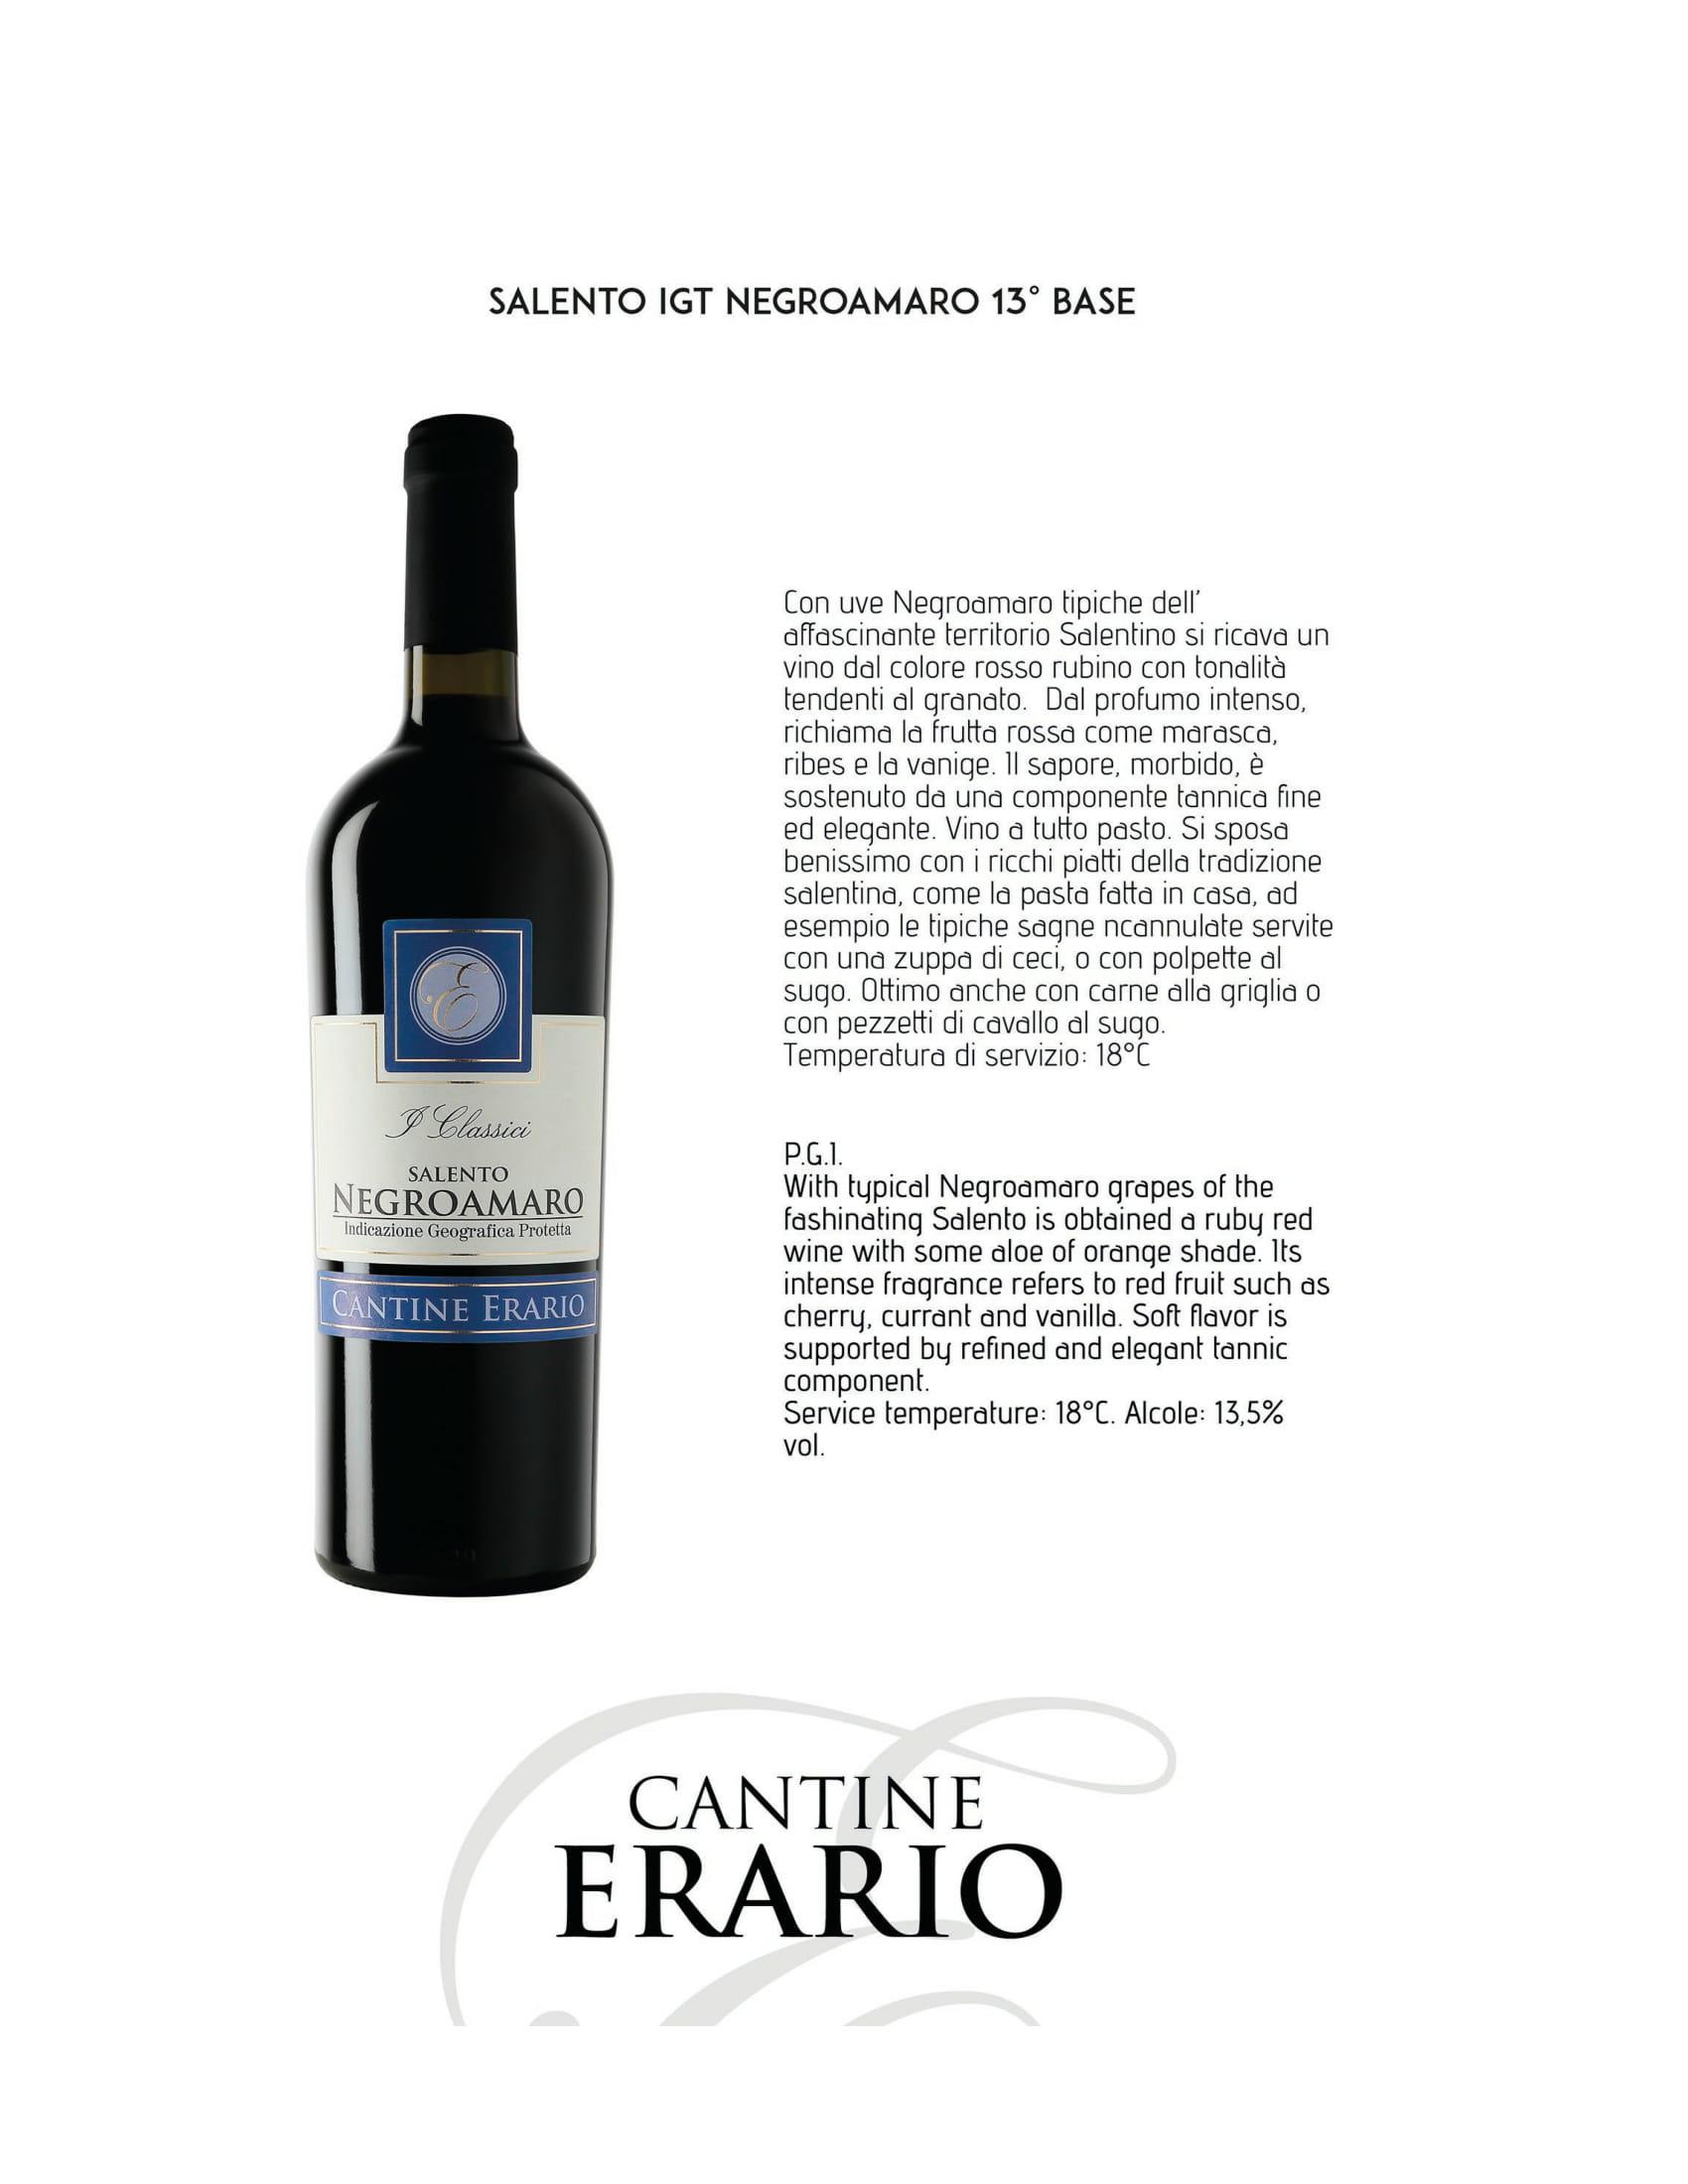 erario vino negroamaro 13 base-1jpg